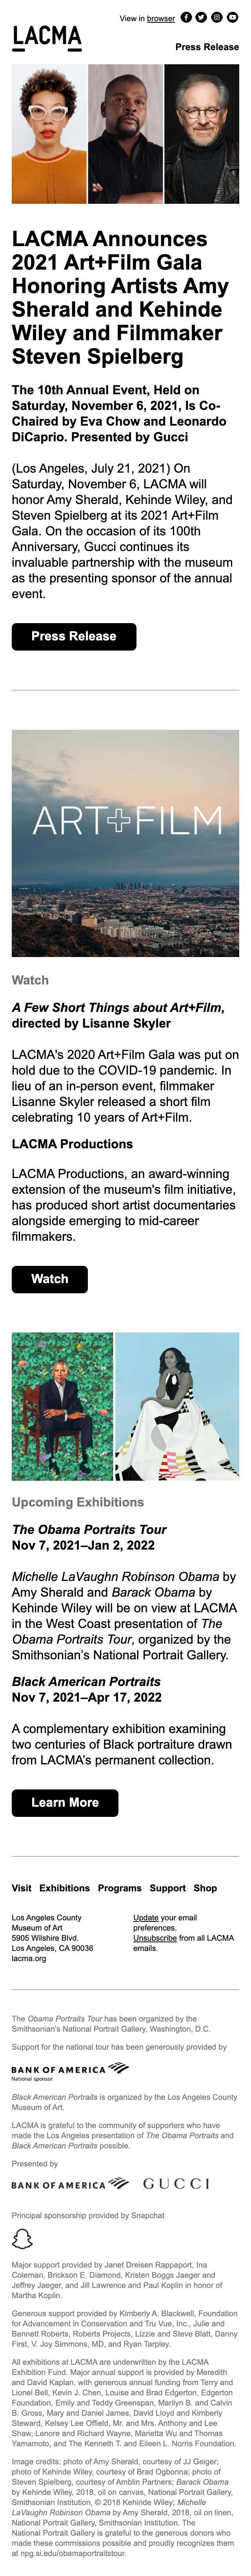 LACMA Announces 2021 Art+Film Gala Honorees - mobile view